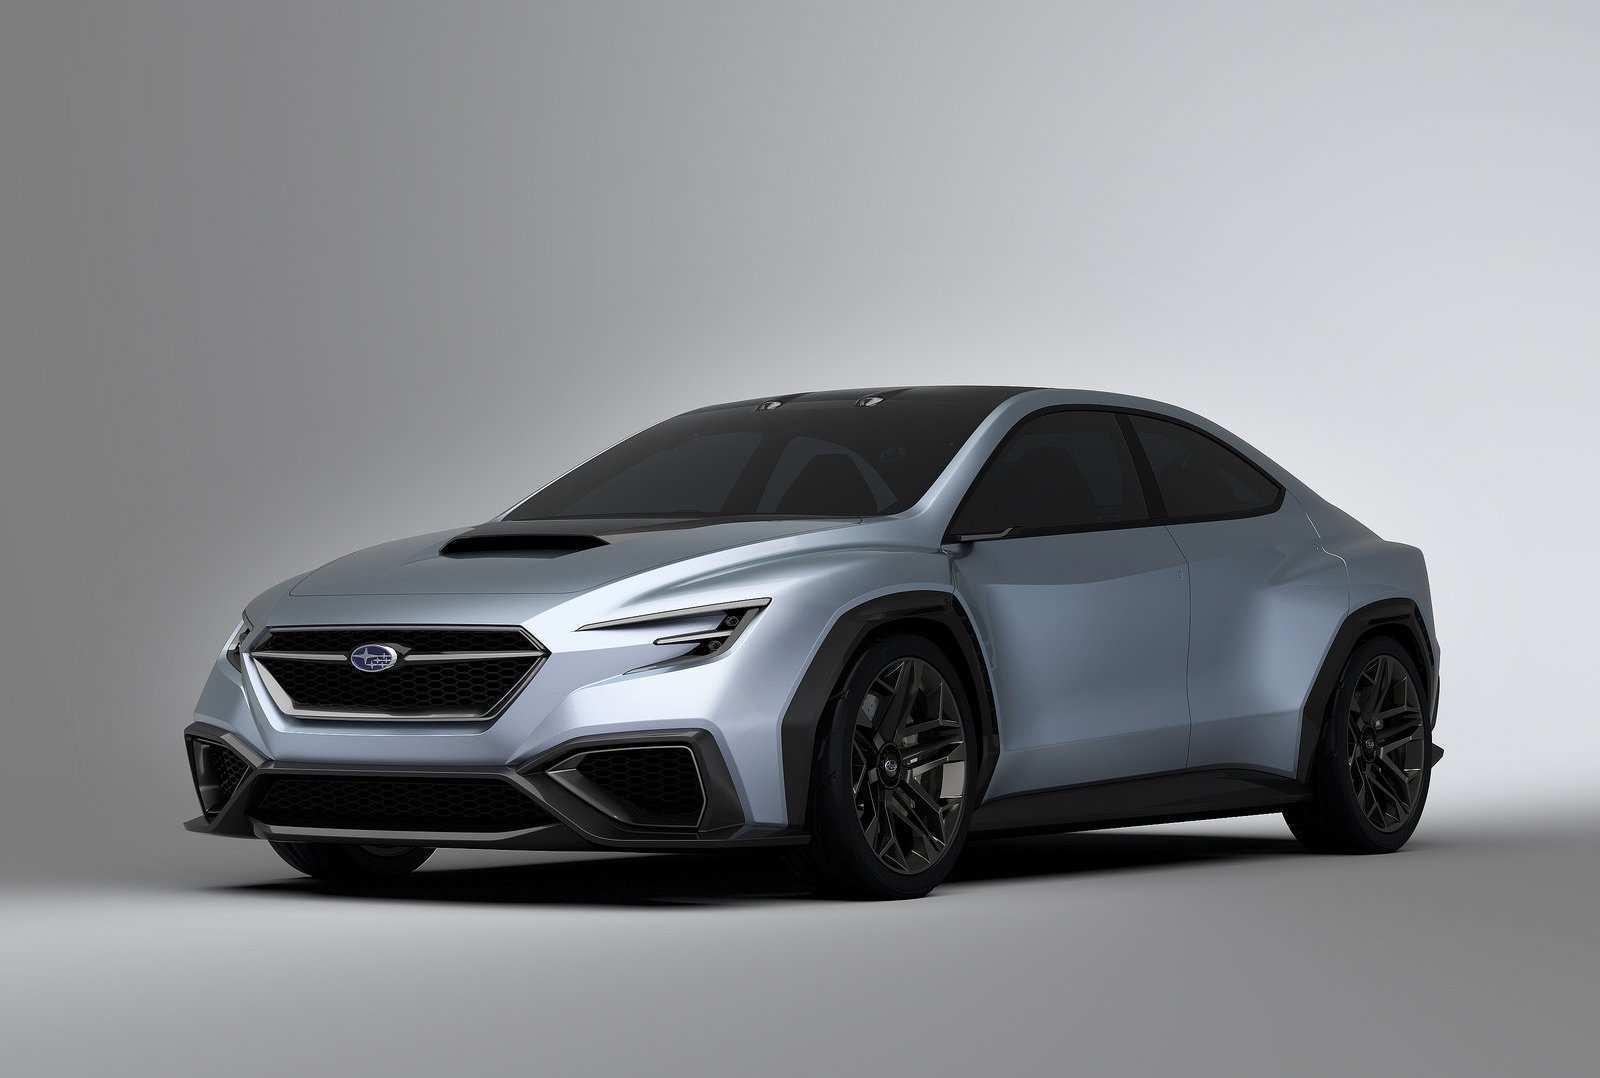 25 Great 2020 Subaru Sti Concept Spy Shoot by 2020 Subaru Sti Concept